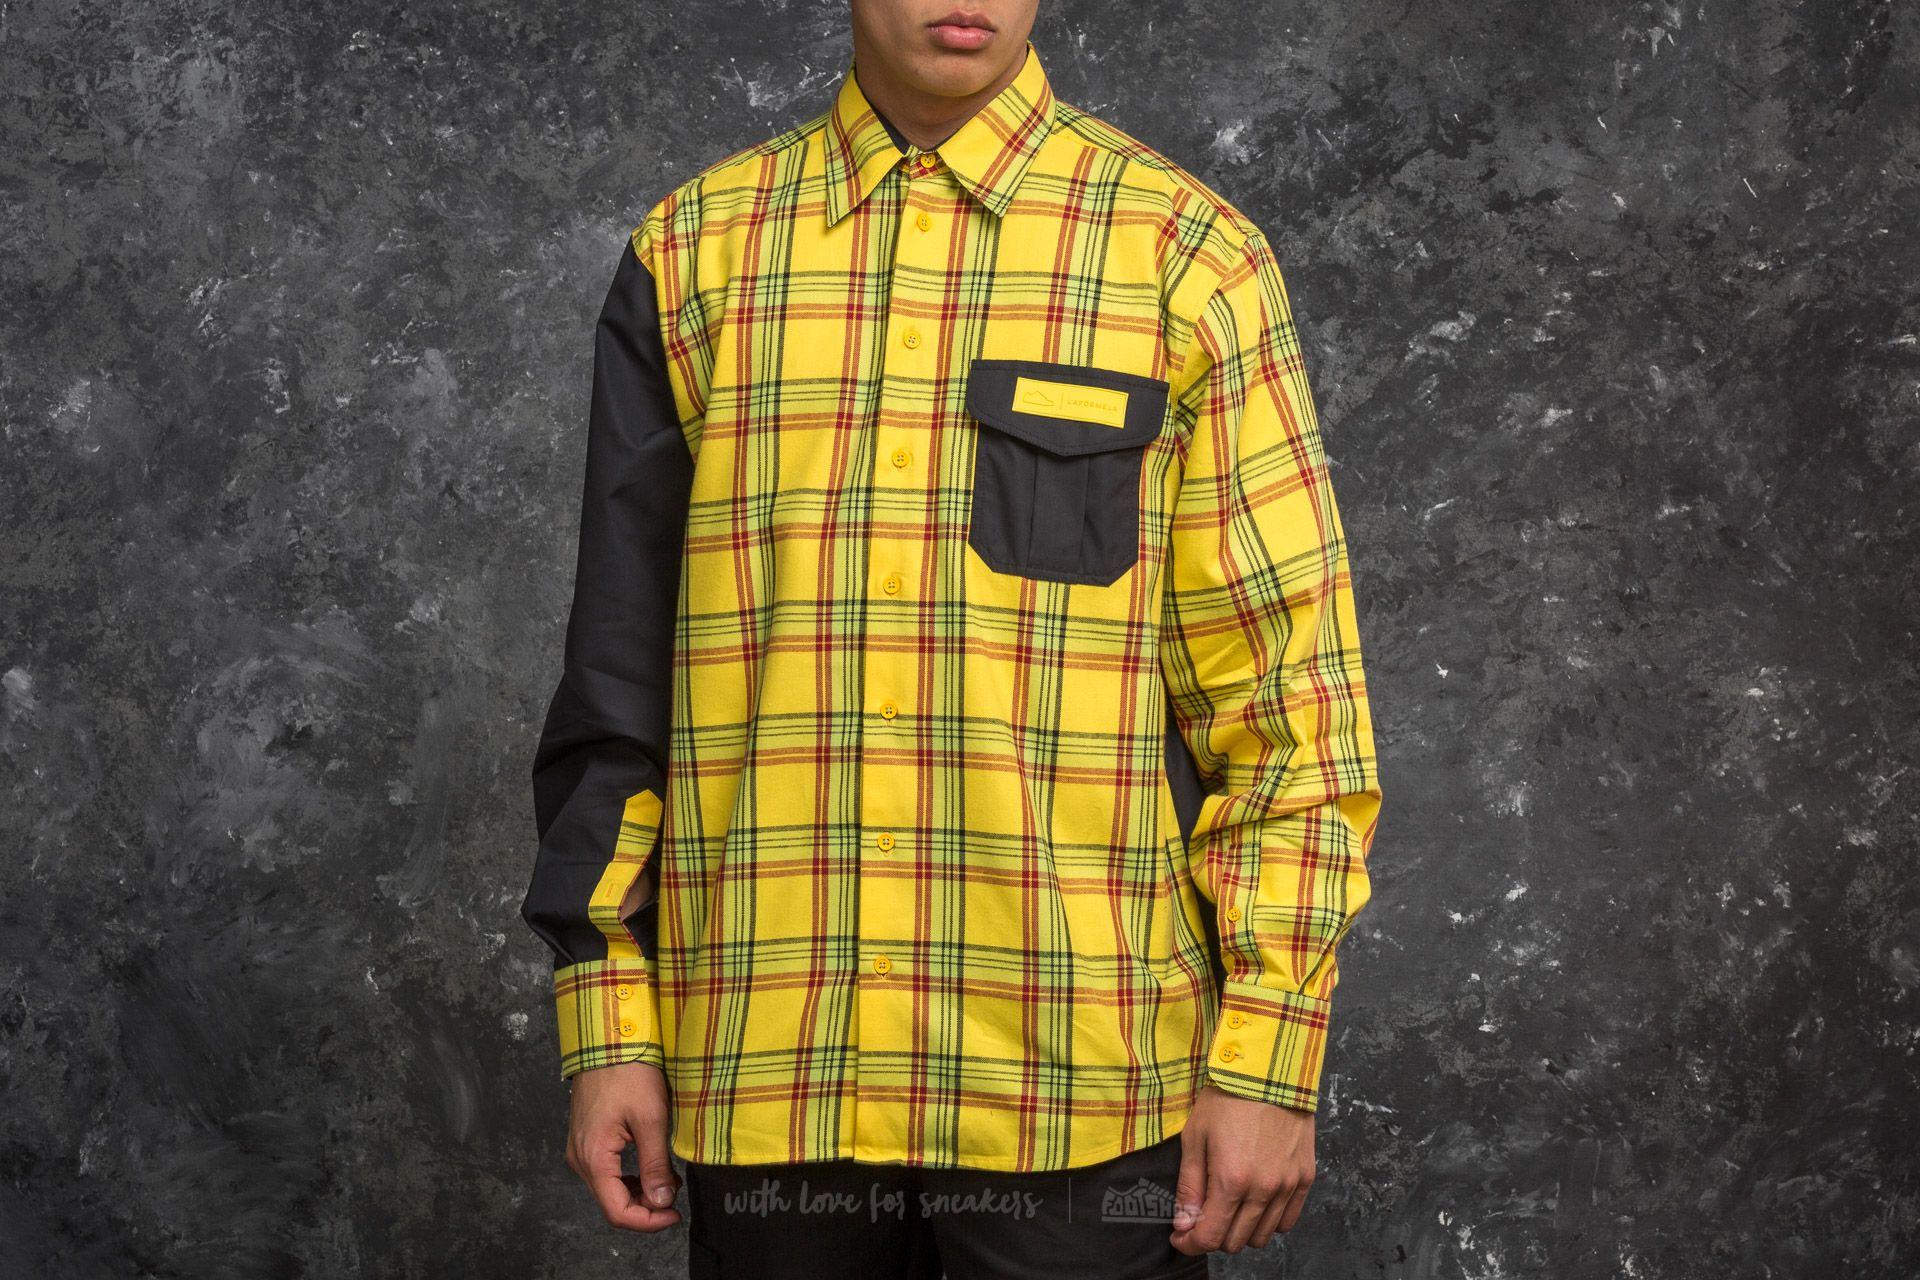 Footshop x LAFORMELA Shirt Yellow/ Black za skvělou cenu 2 090 Kč koupíte na Footshop.cz